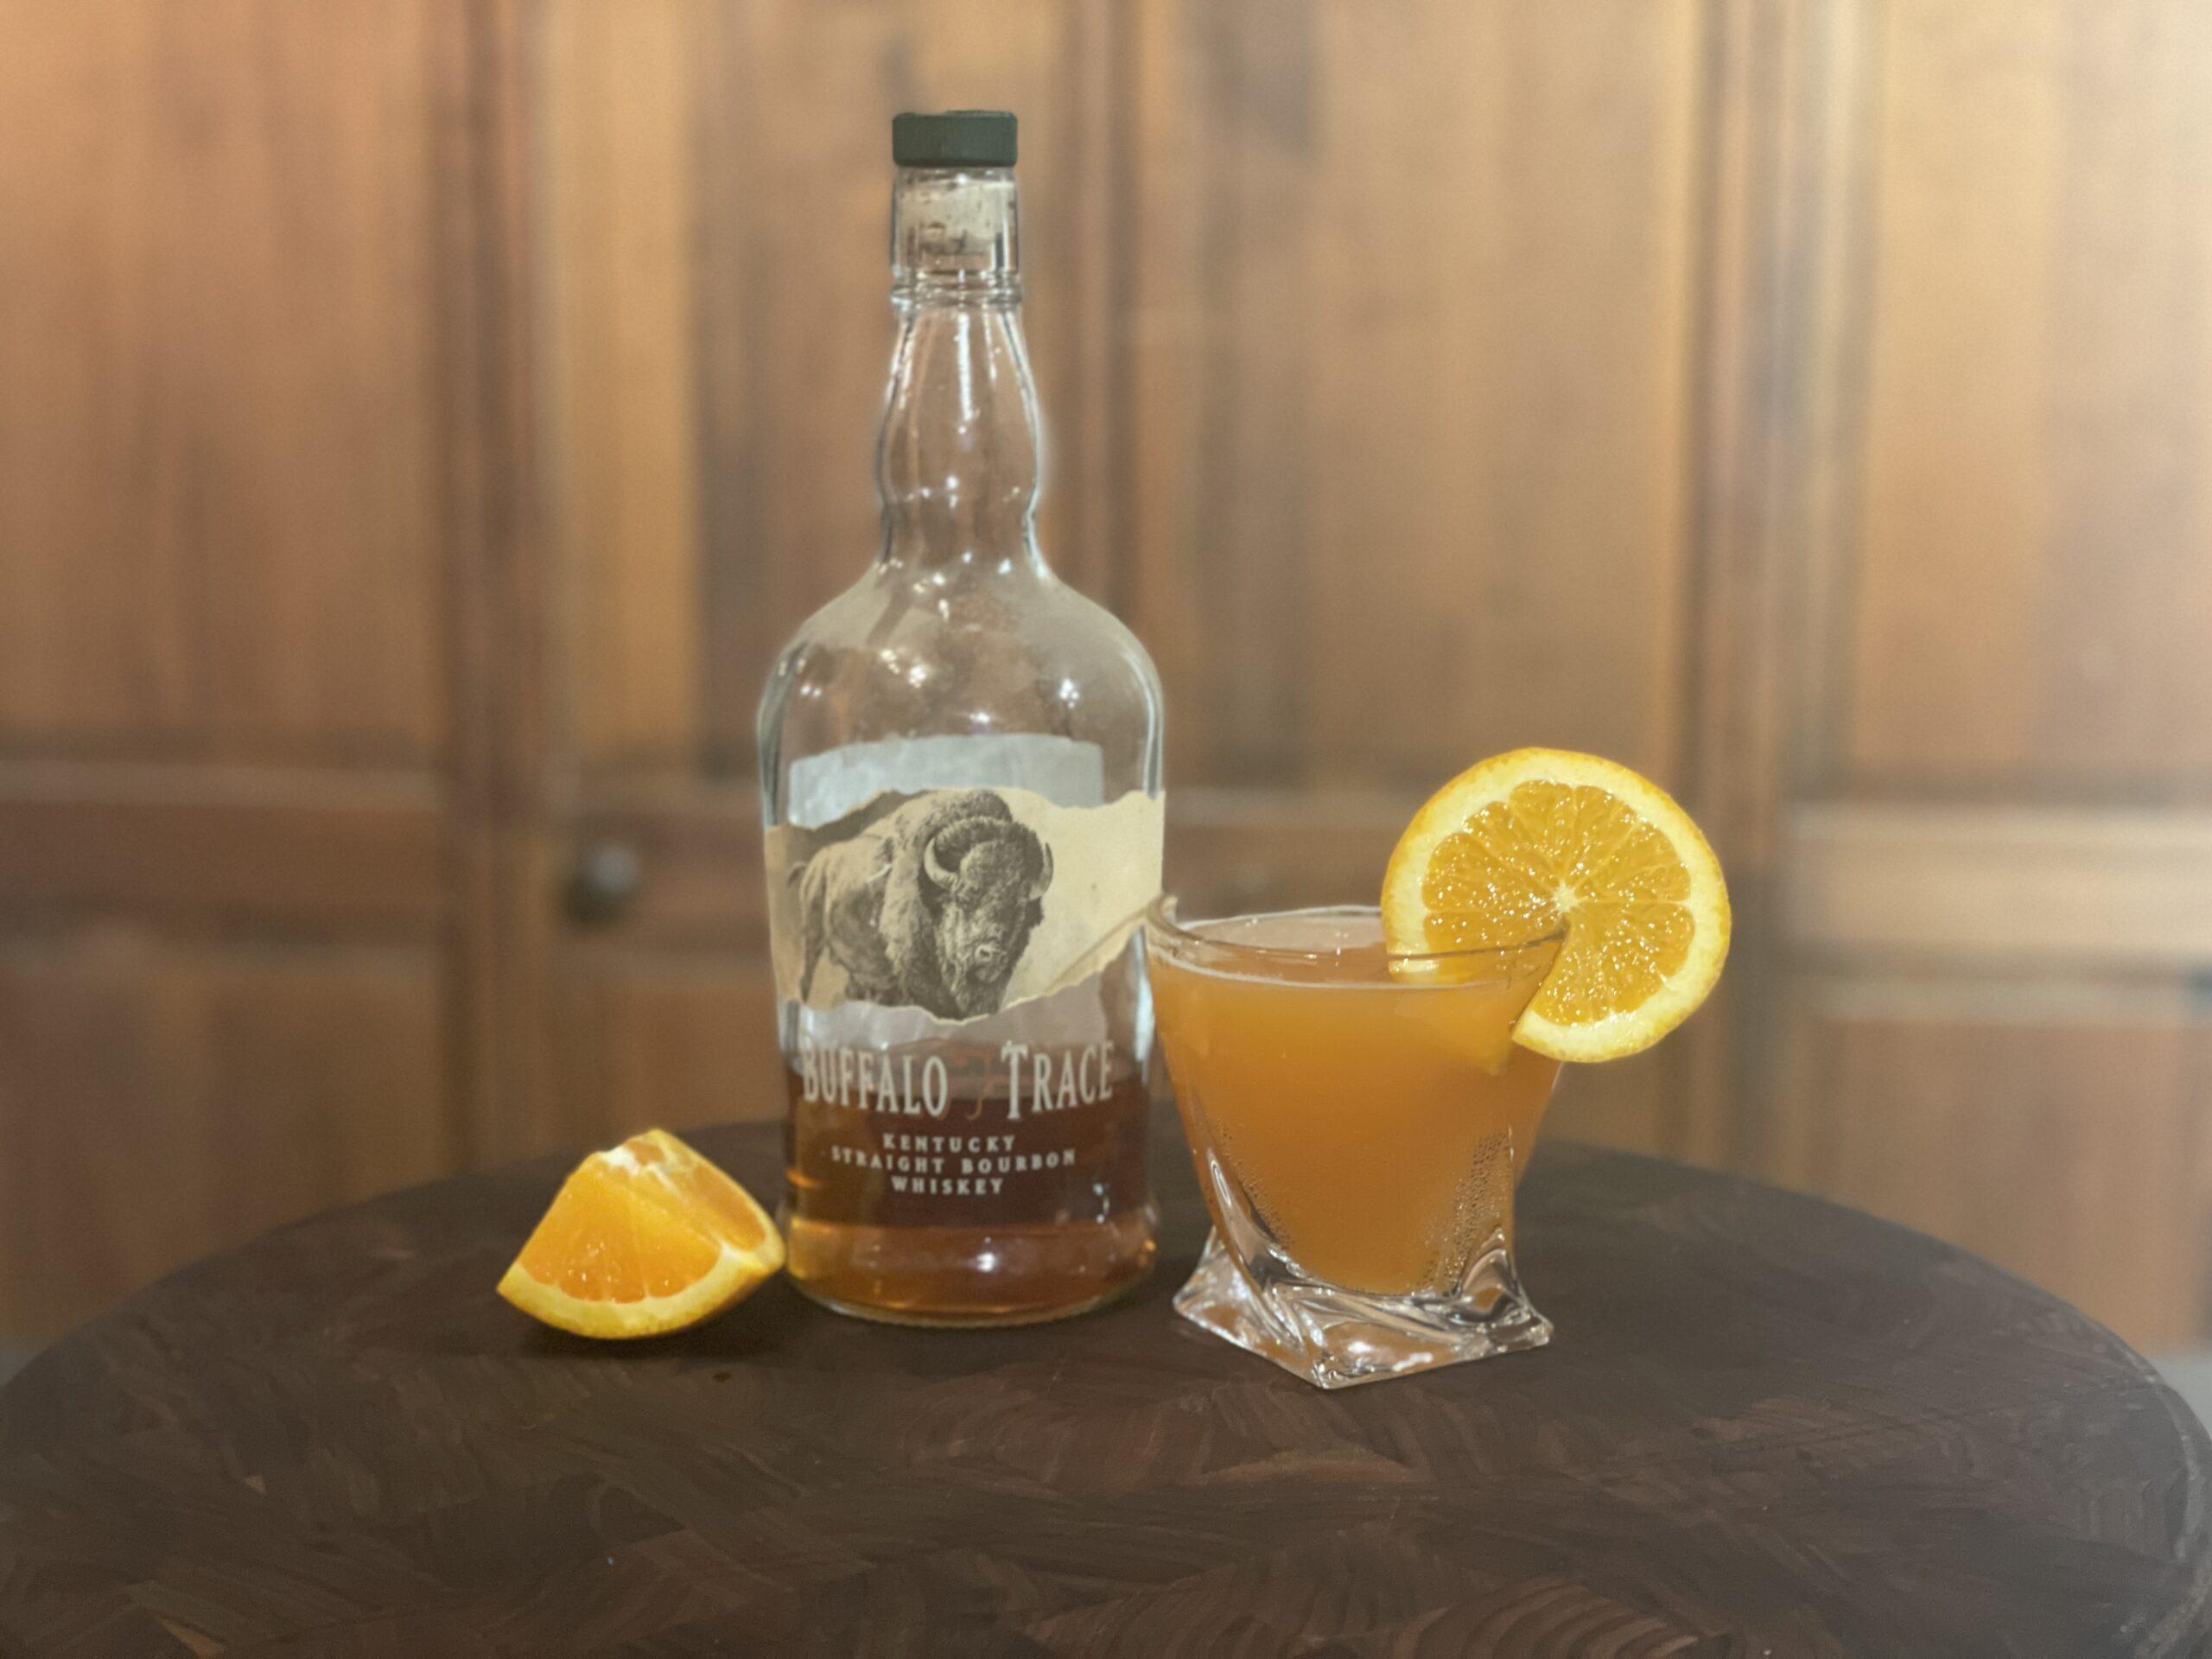 The Lynyrd skynyrd cocktail Robert Forto